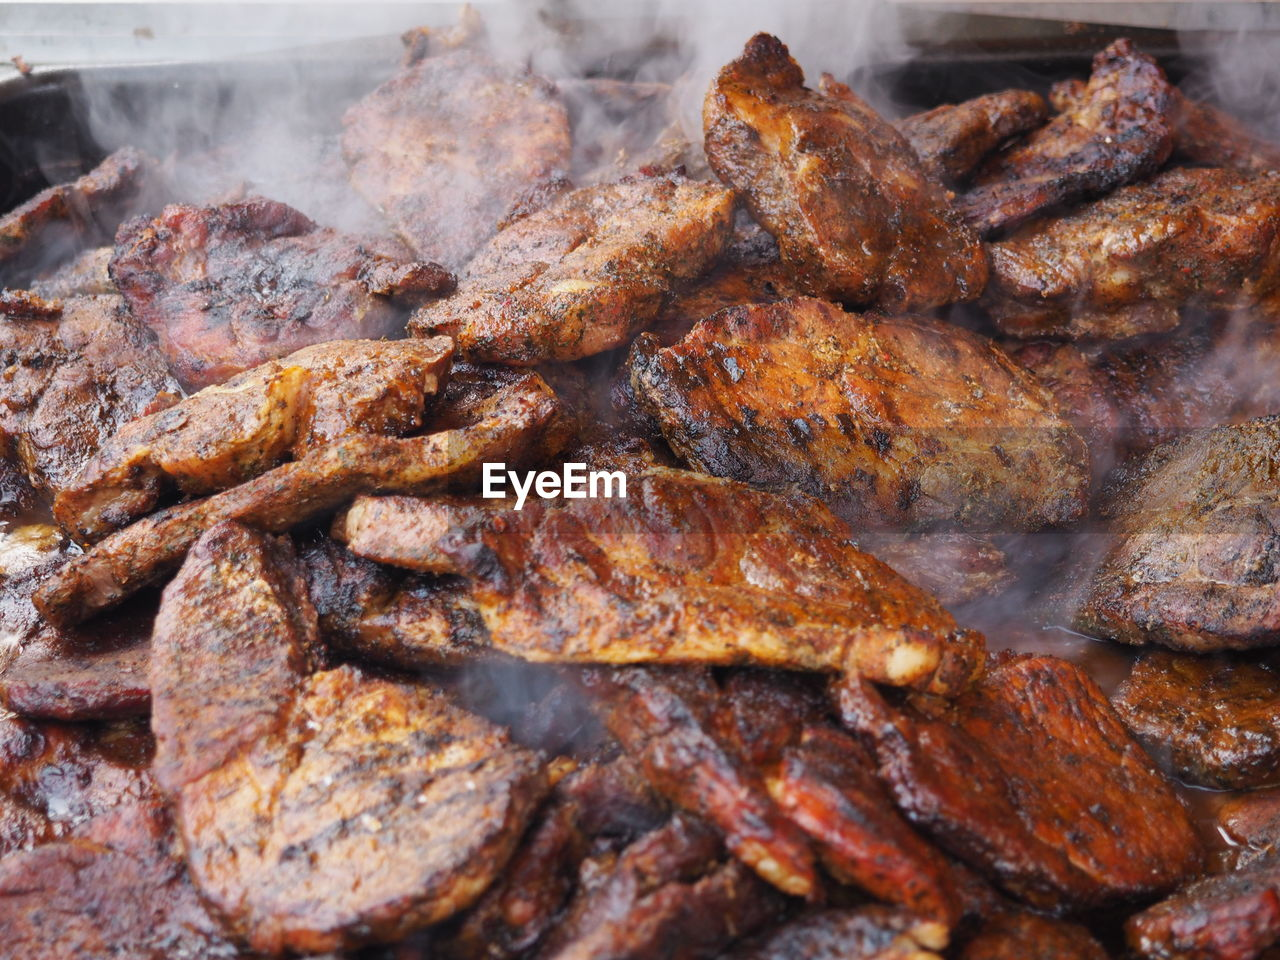 Full Frame Of Barbecued Pork